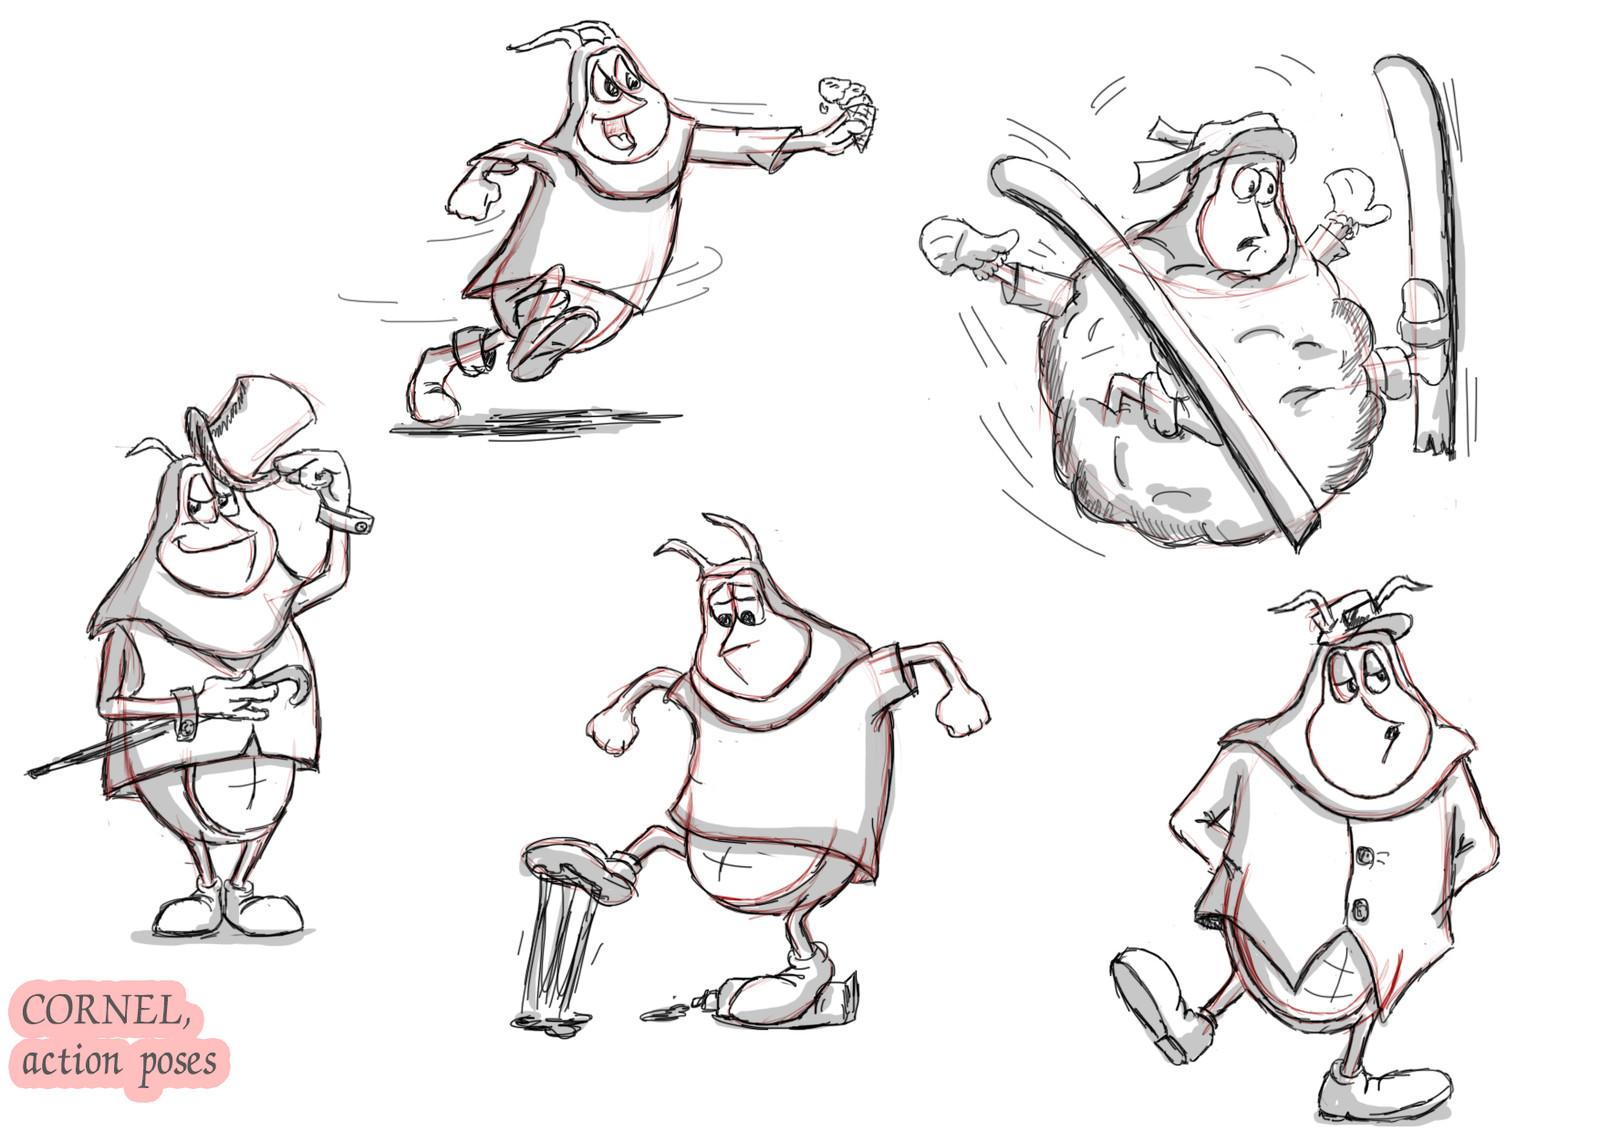 Cornelius, Character Design Sheets